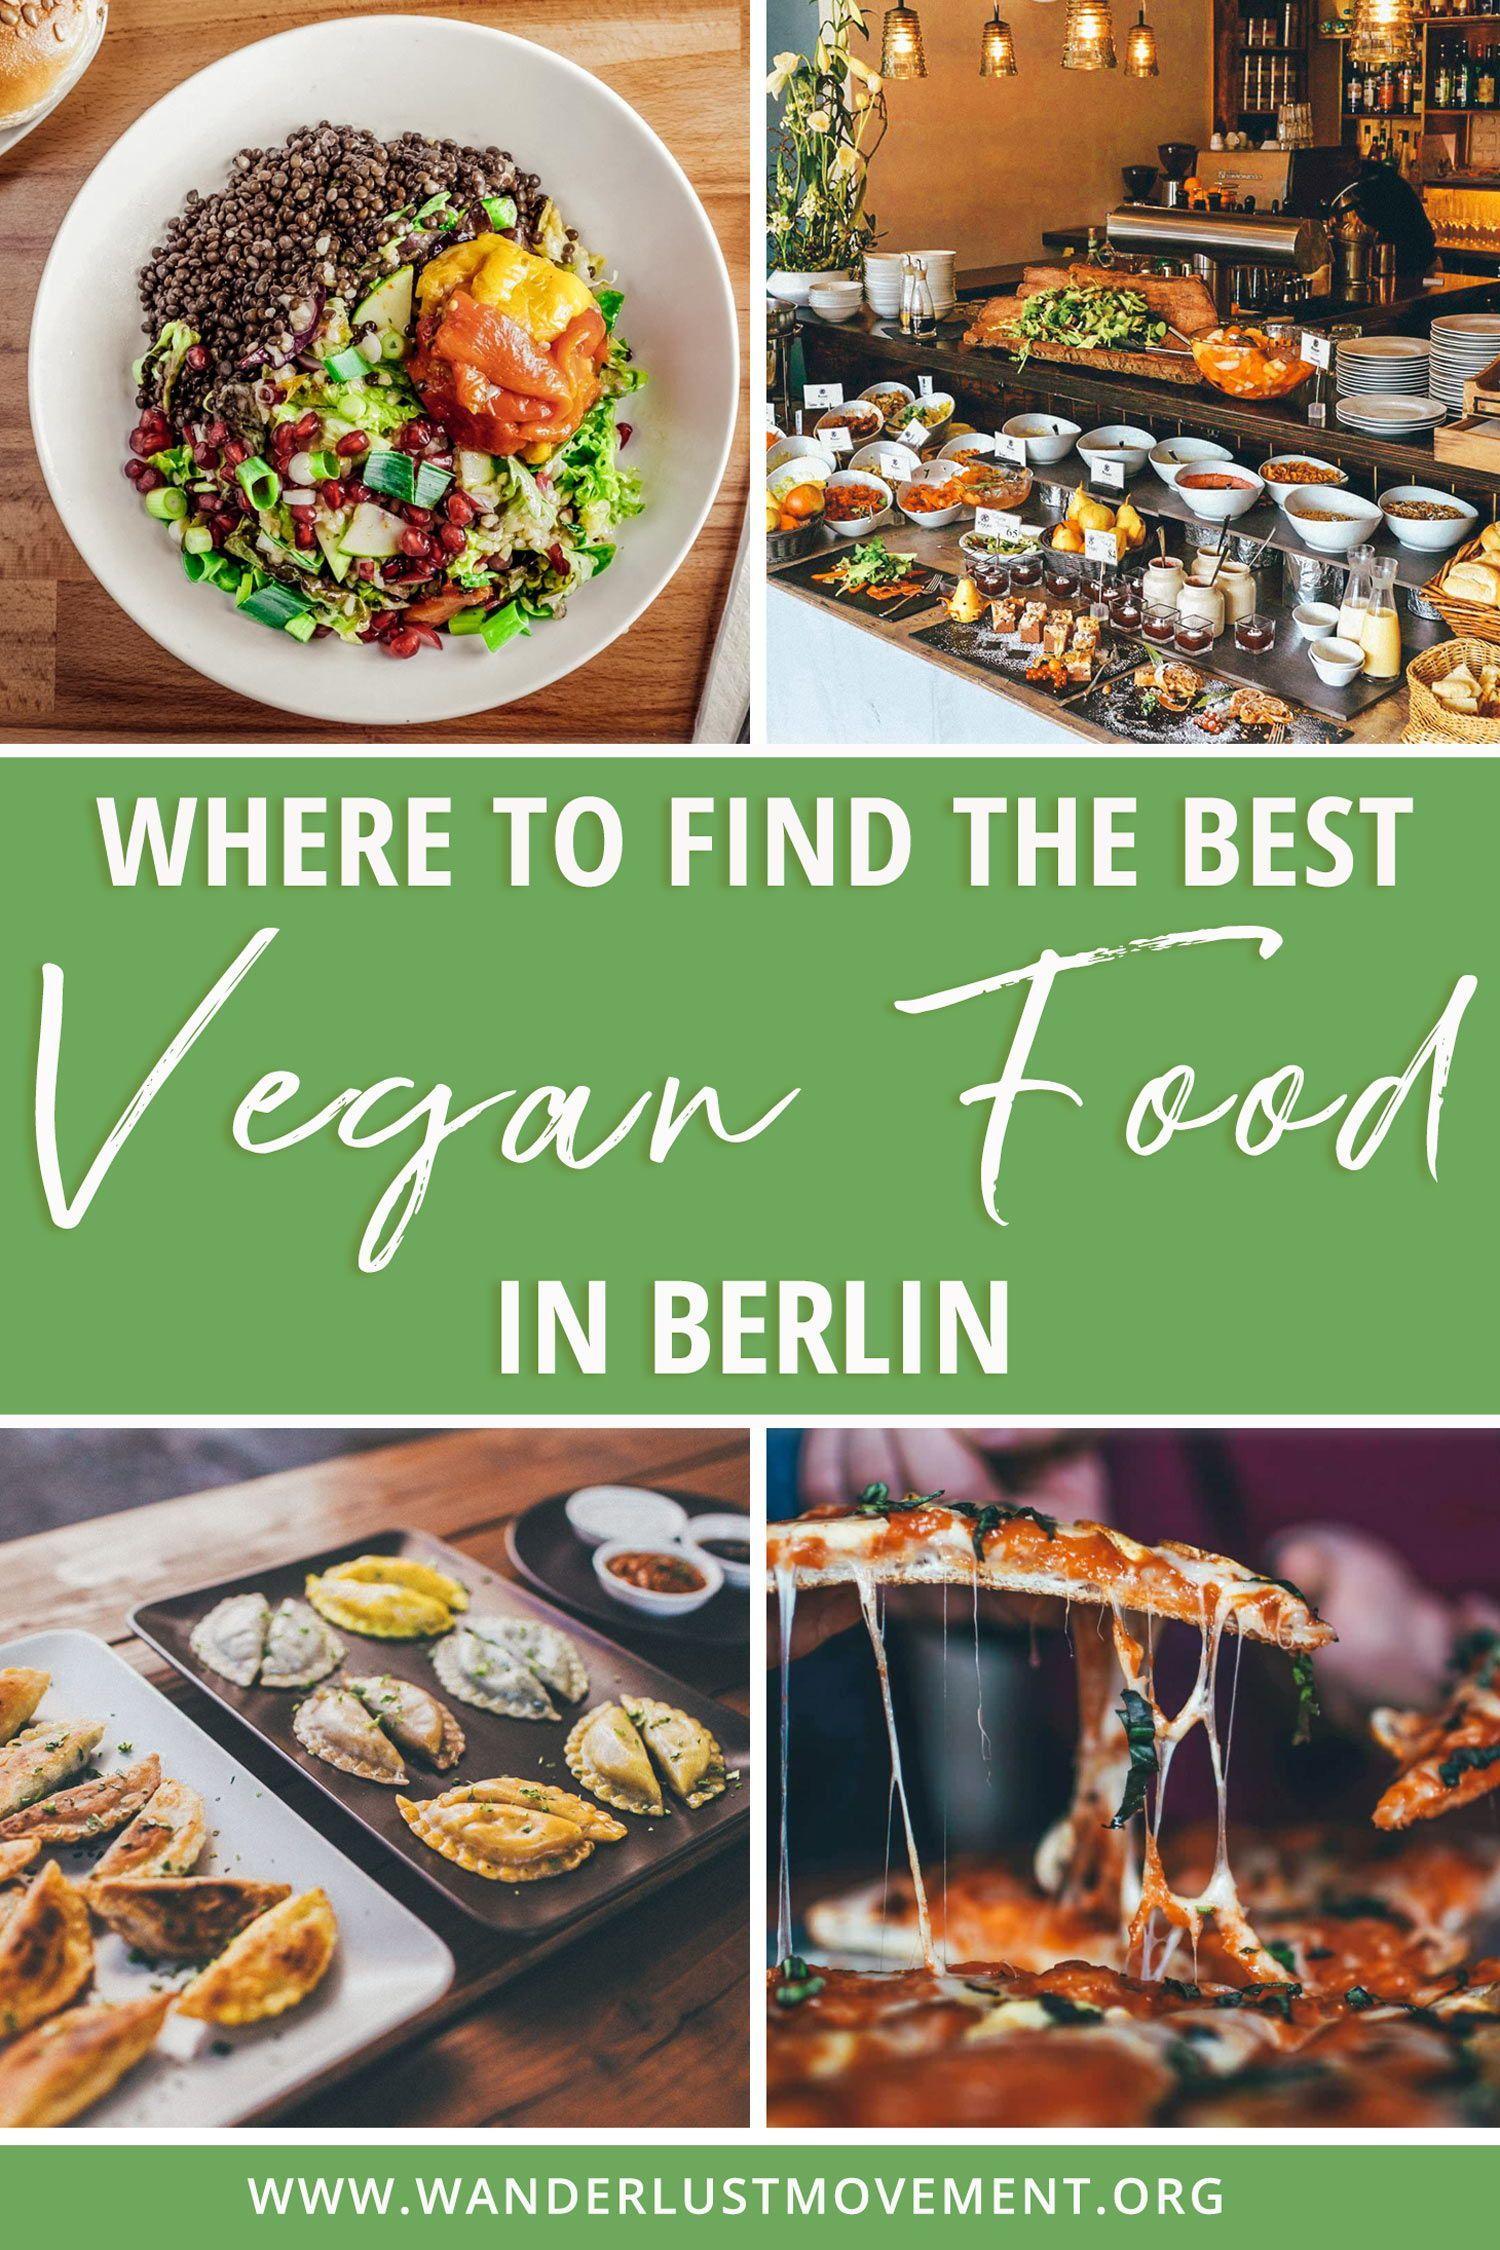 Where To Find The Best Vegan Food In Berlin In 2020 Vegan Recipes Vegan Restaurants Travel Food